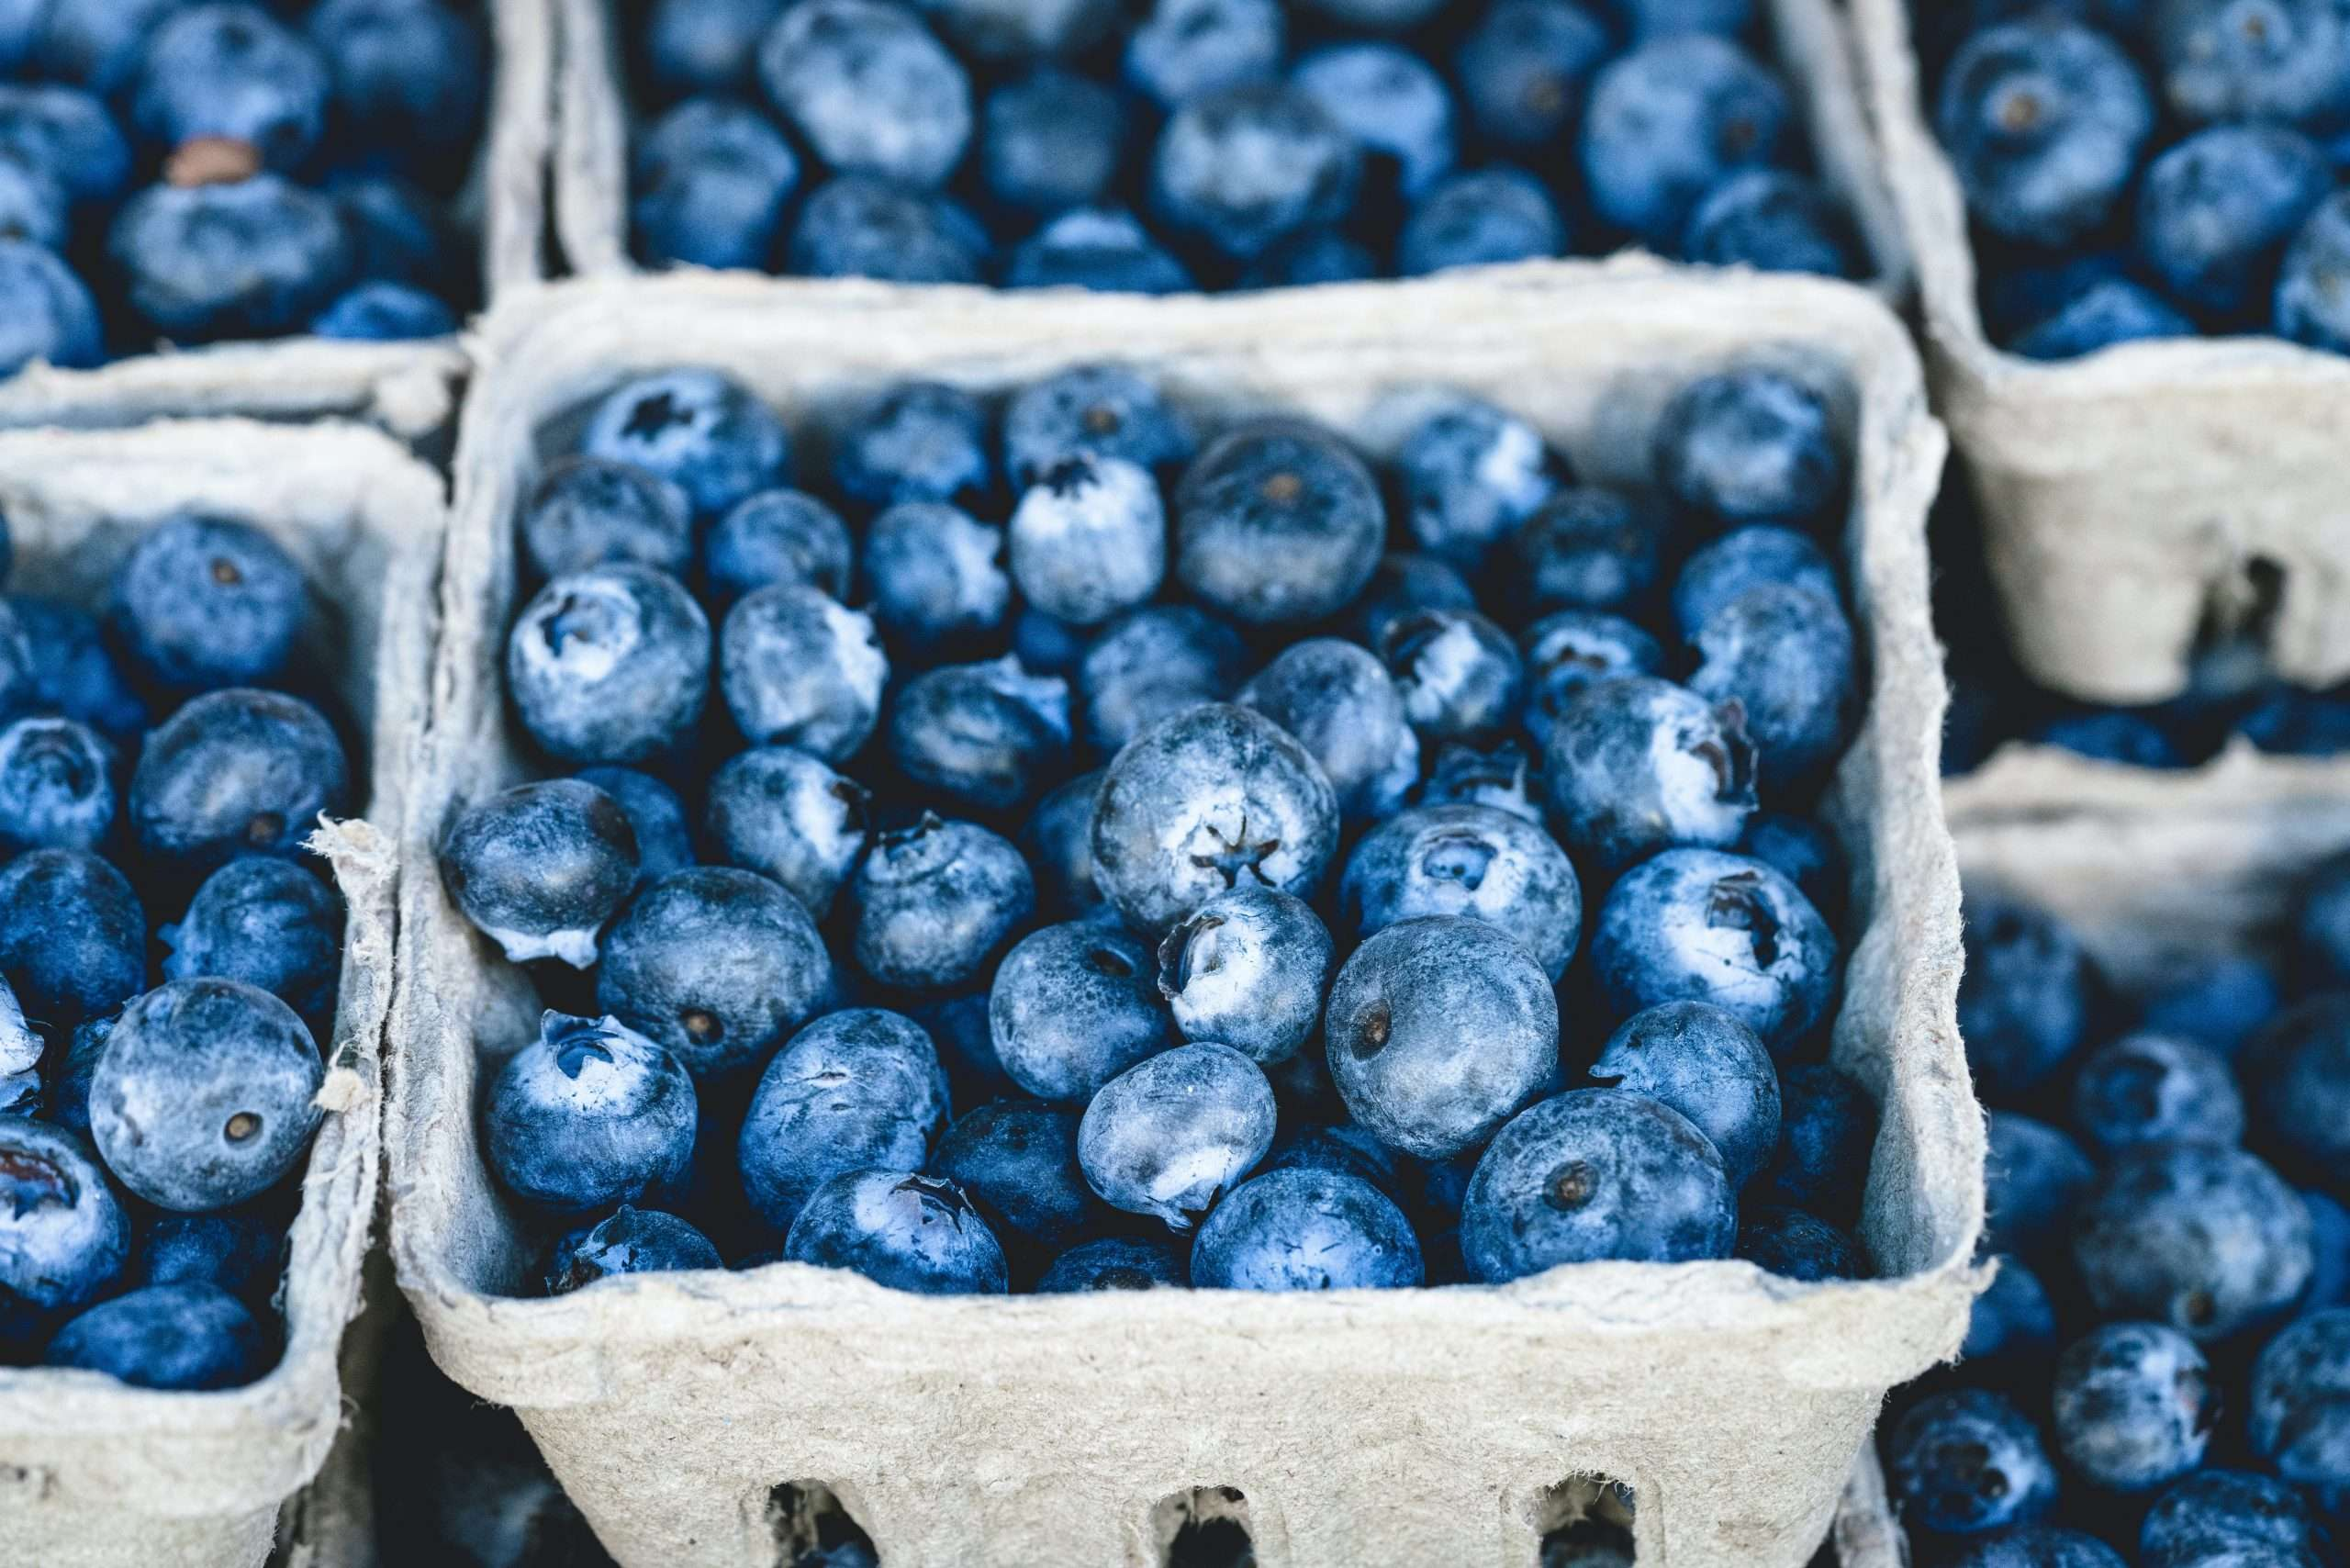 blueberries simple food that tastes good